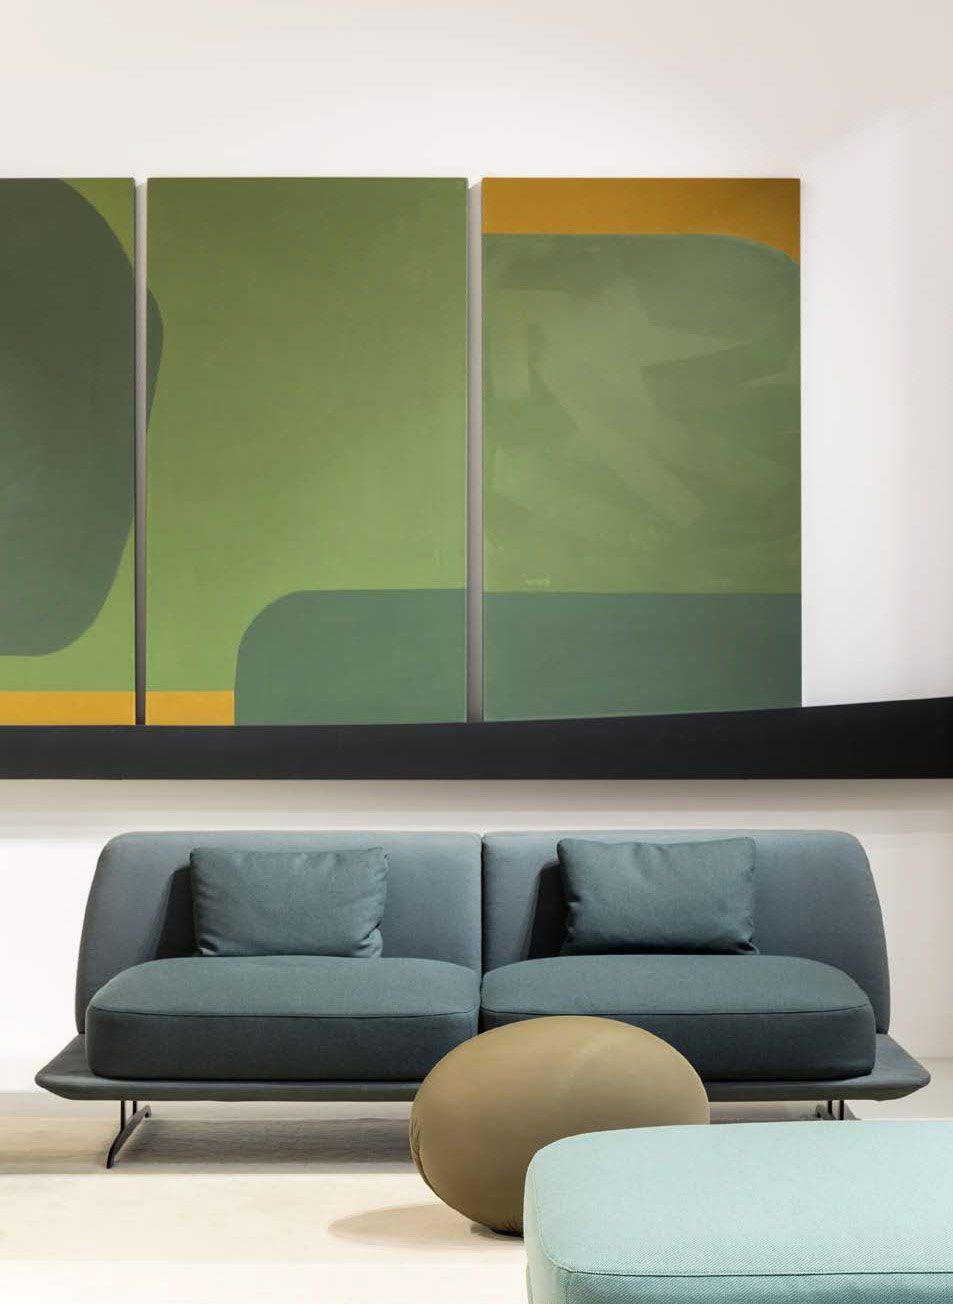 Trays Sofa Set Designed By Parisotto Formenton For Baleri Italia Available At Linea Inc